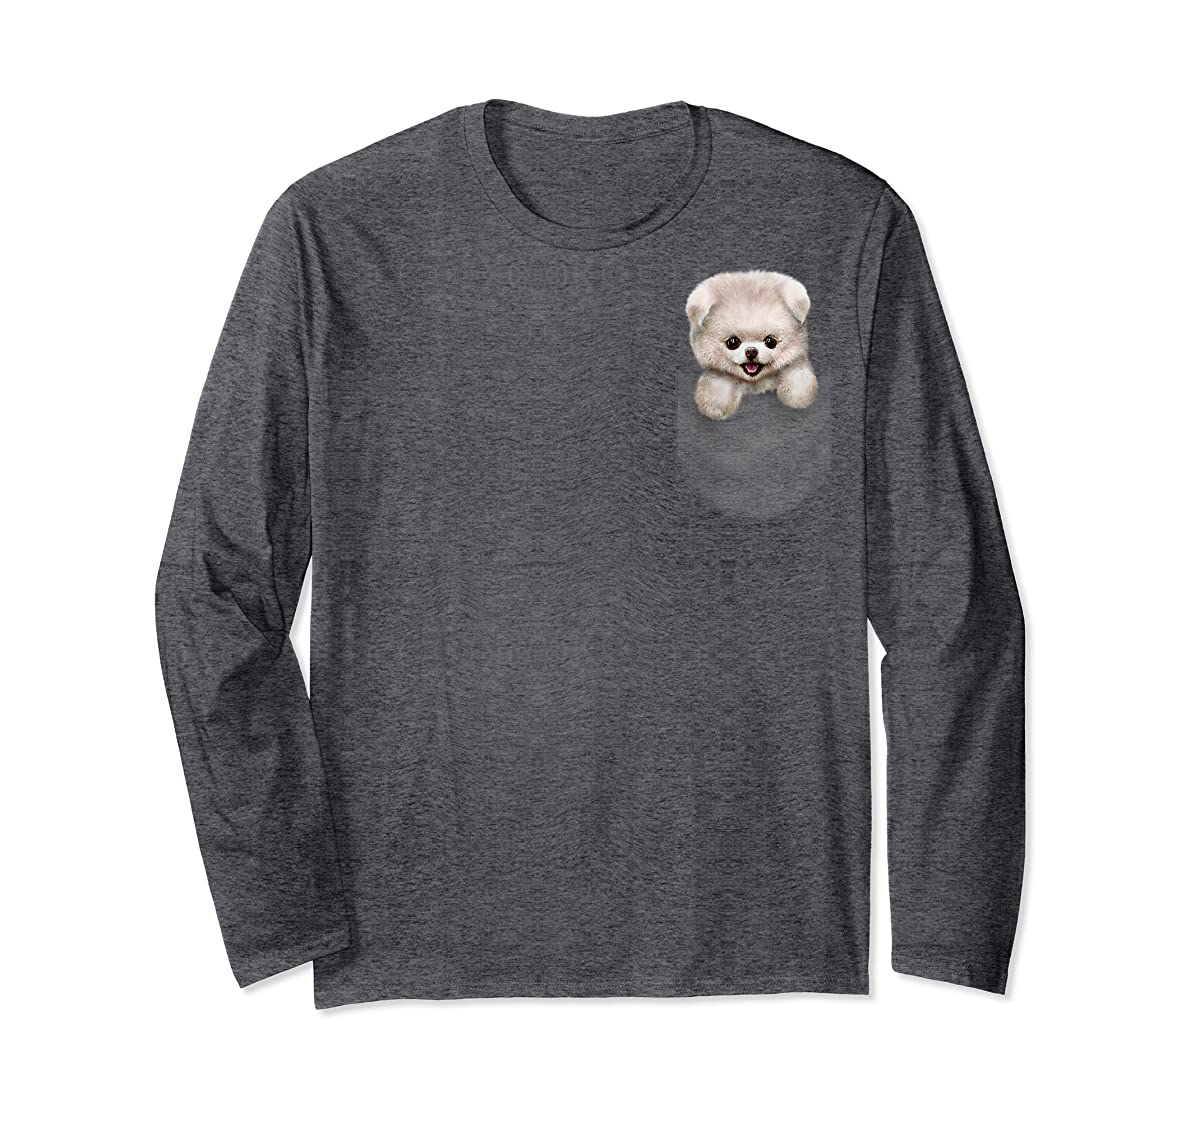 T-Shirt, Cute White Fluffy Pomeranian Puppy in Pocket, Dog-Long Sleeve-Dark Heather